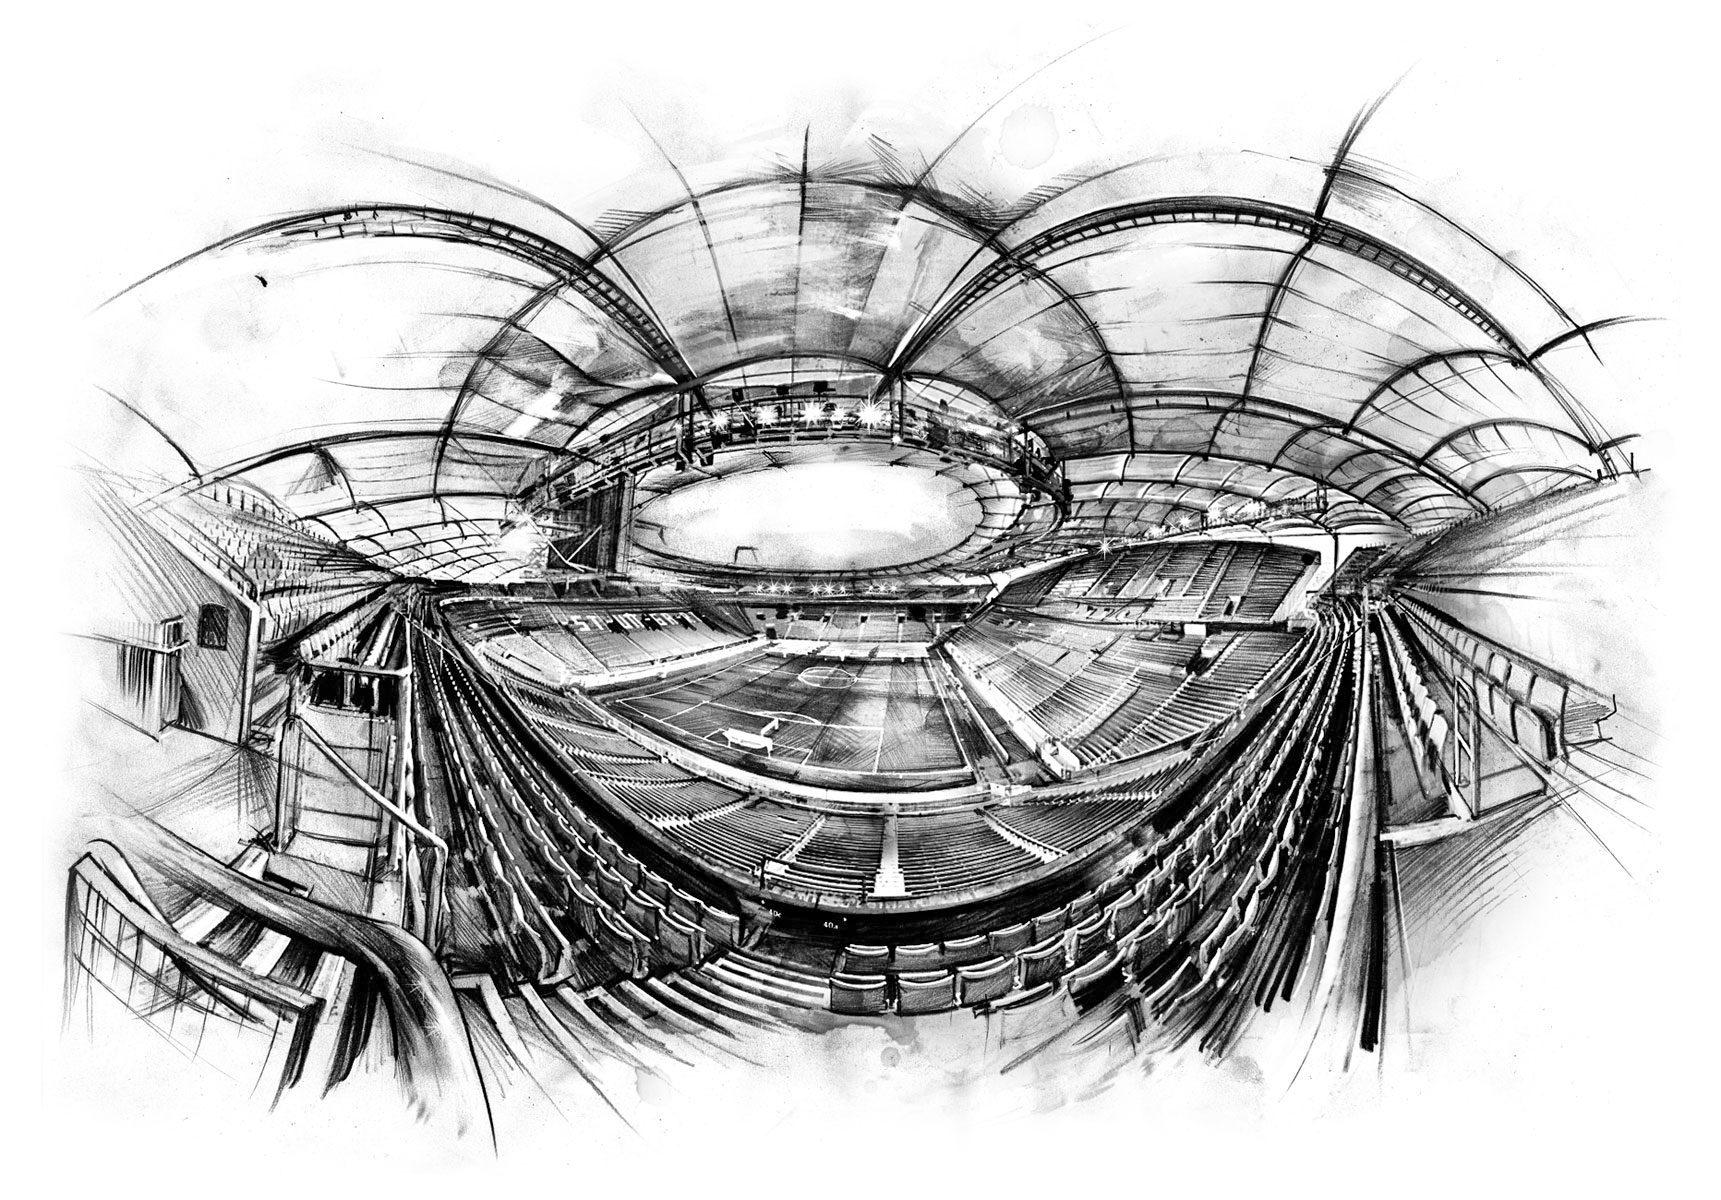 Mercedes Benz Arena 11 - Kornel Illustration | Kornel Stadler portfolio